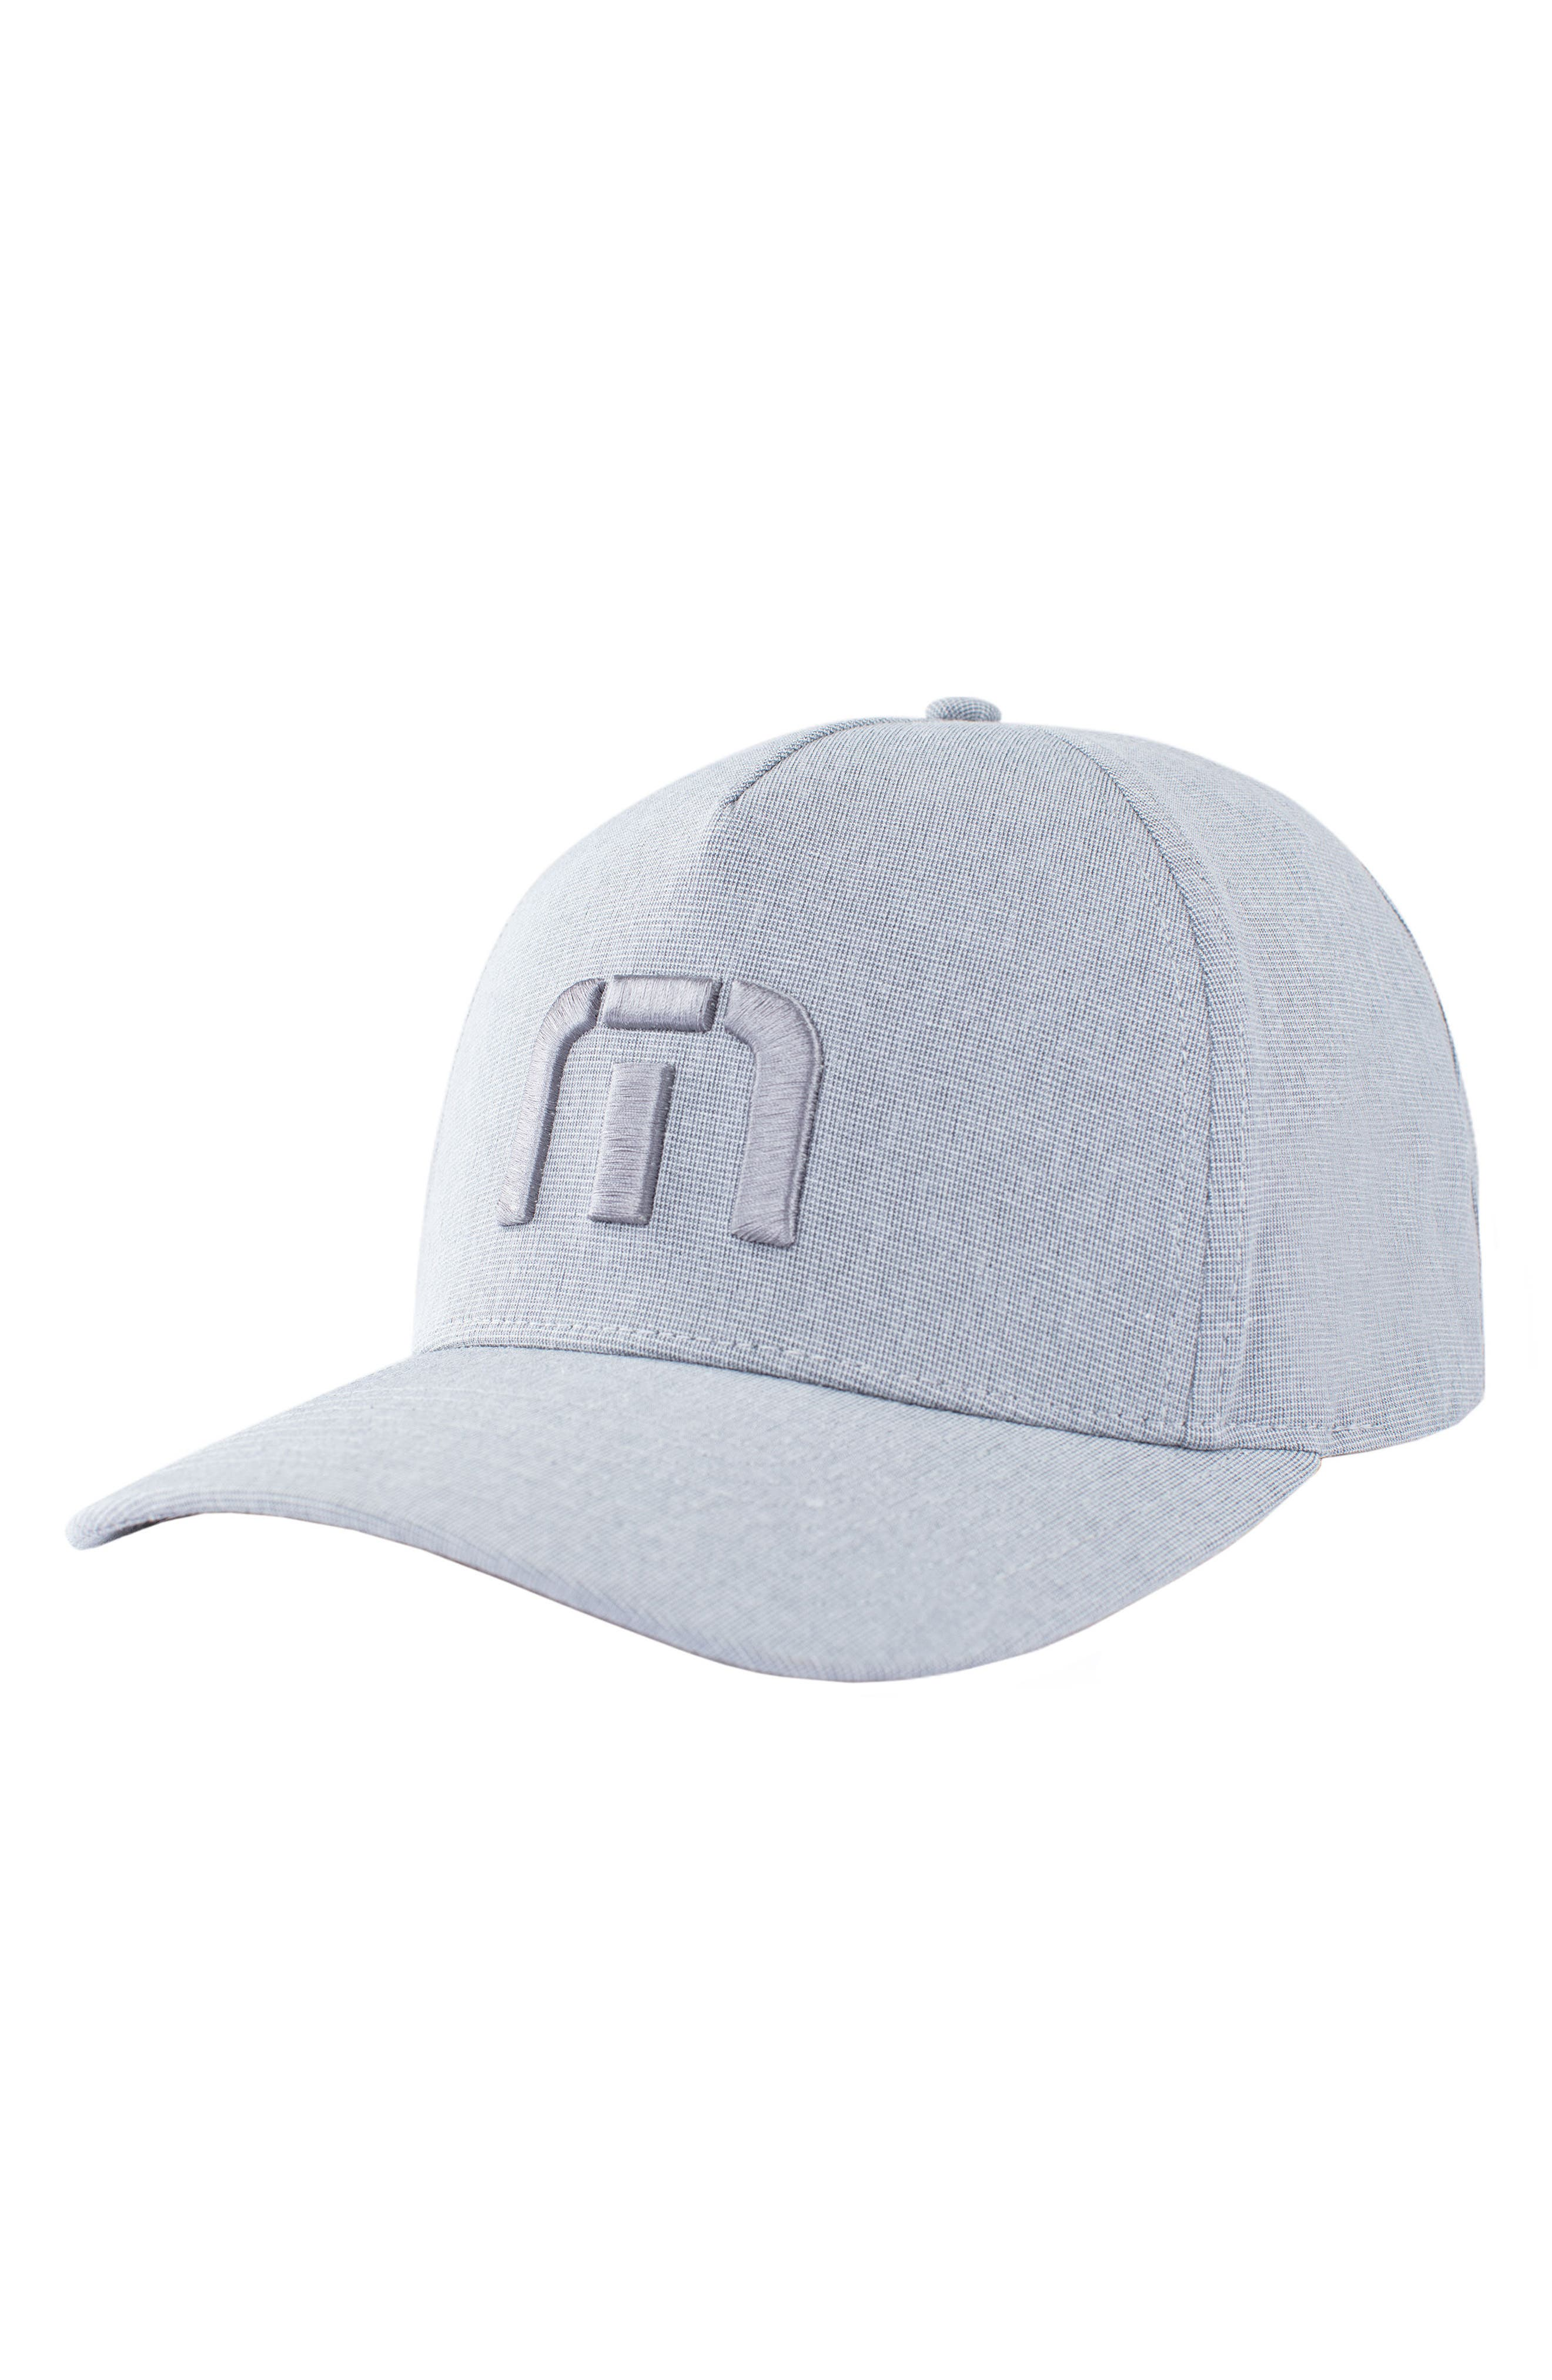 Top Shelf Baseball Cap,                         Main,                         color, LIGHT GREY